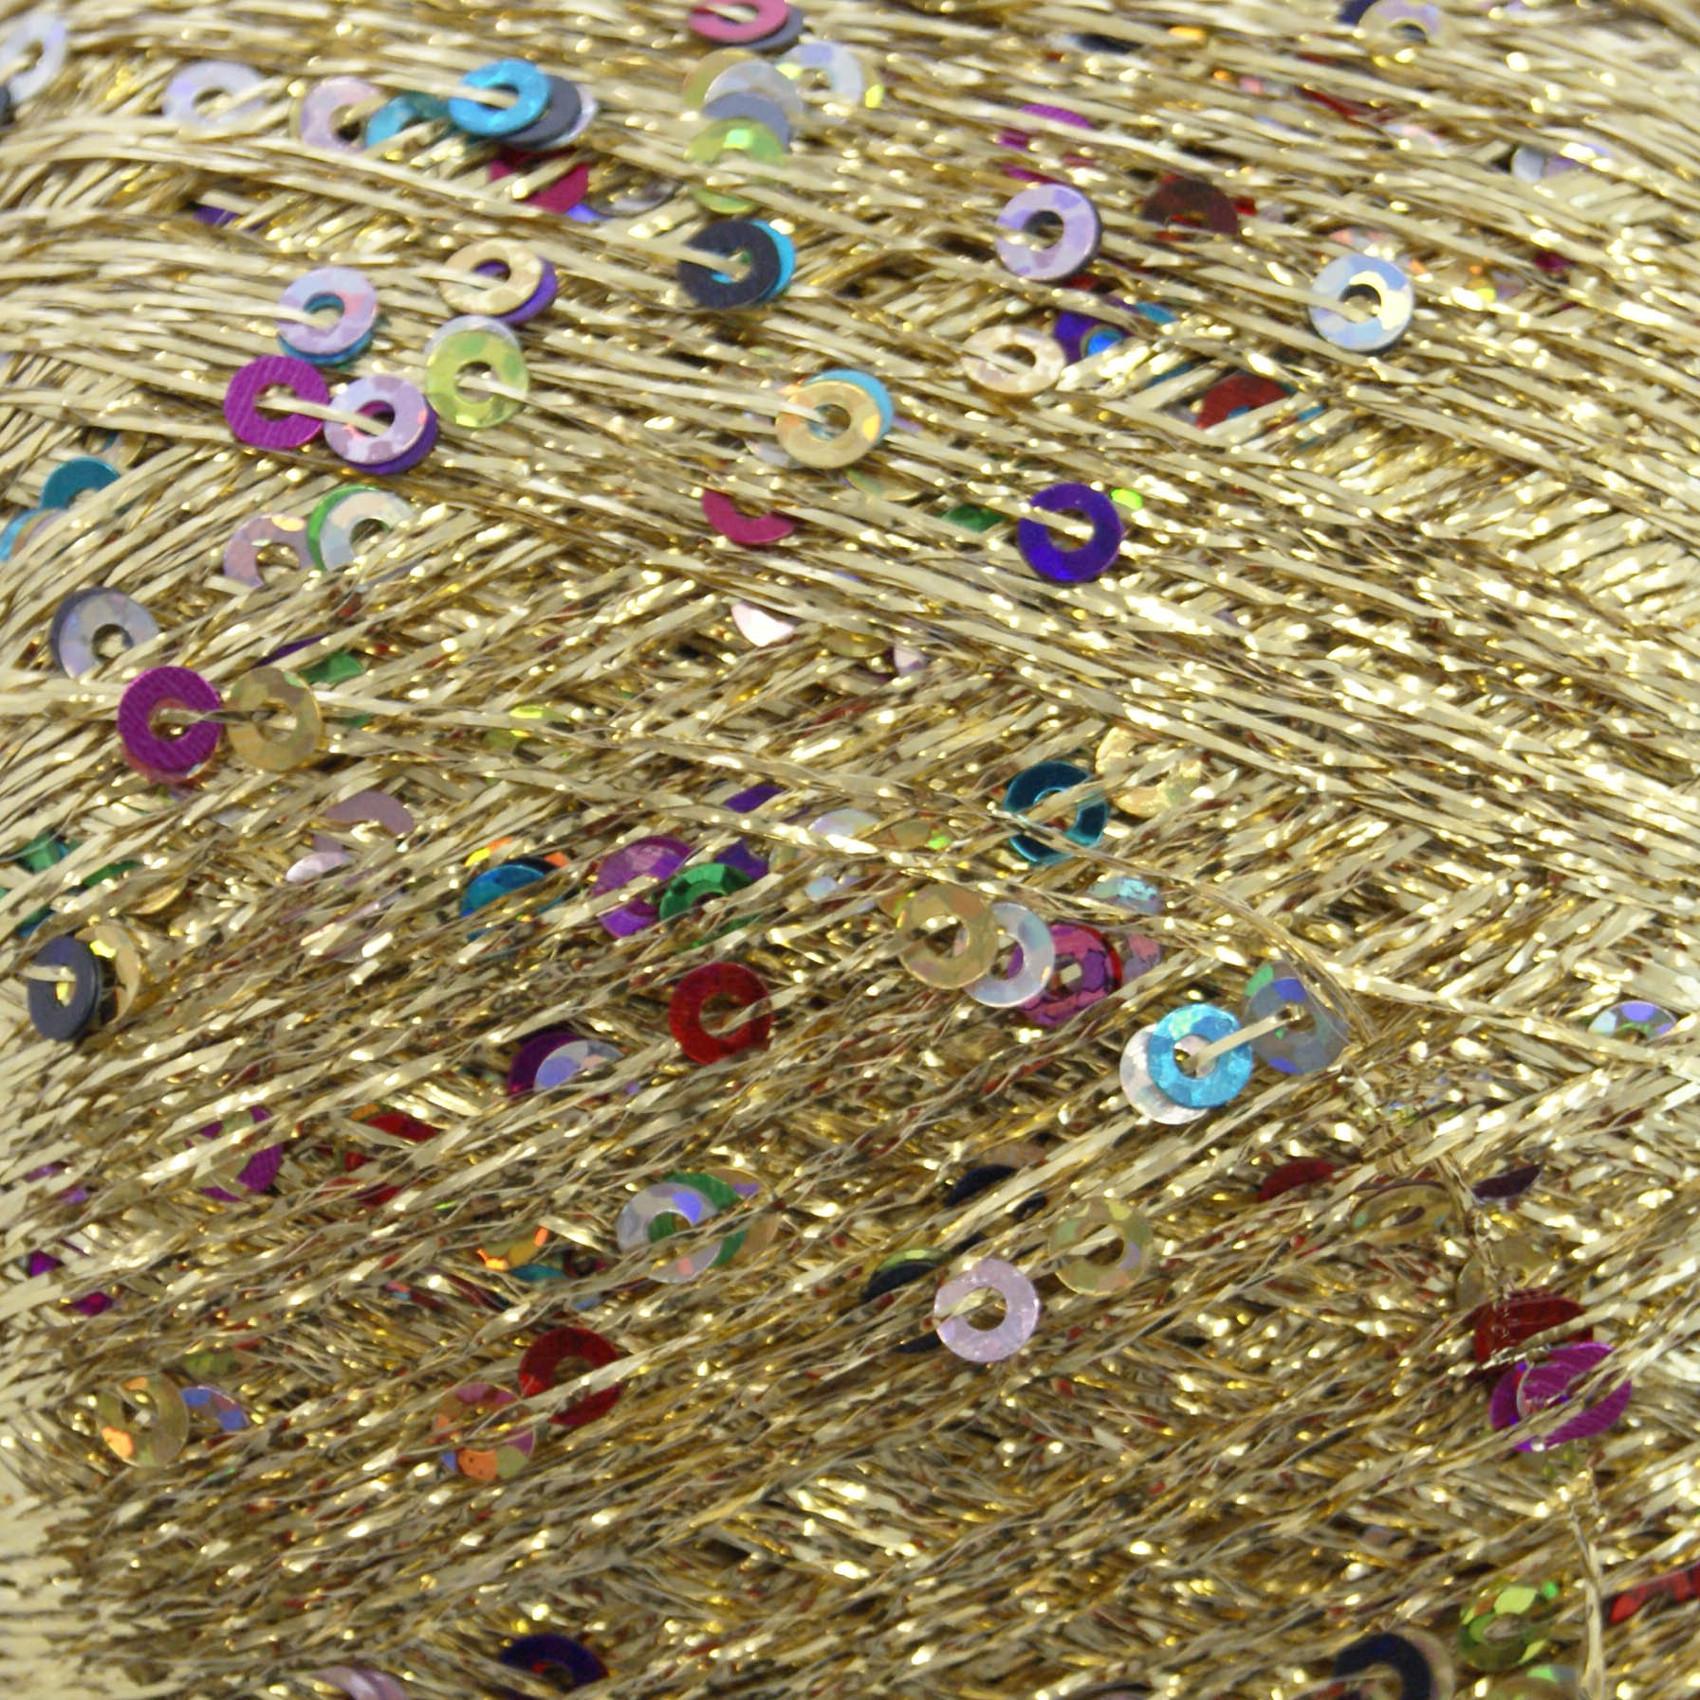 King Cole 25g Cosmos Glitter Sparkle Knitting Yarn Metallic Sequin Craft Wool